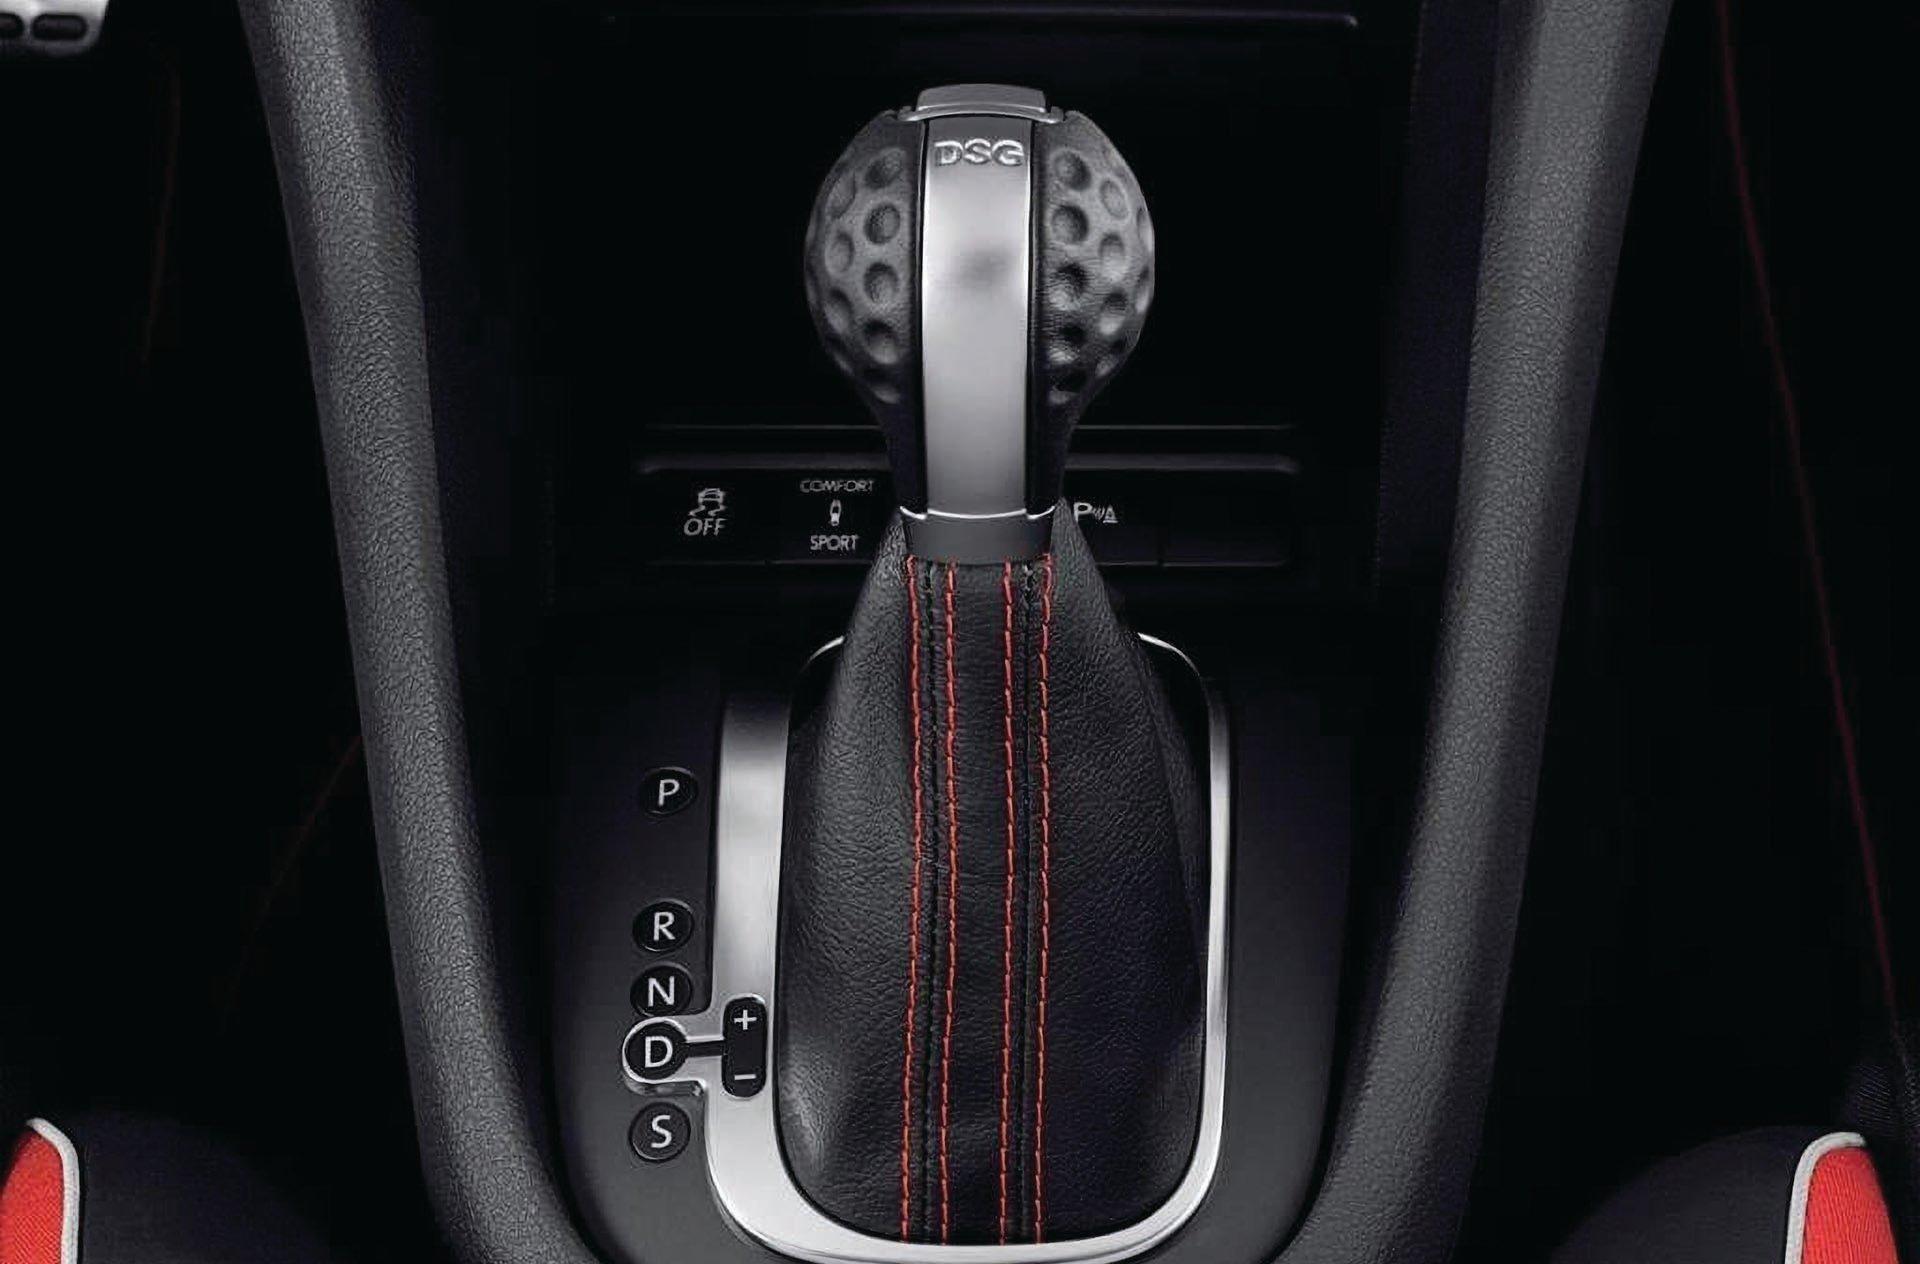 06_VW Audi DSG S Tronic gear selector